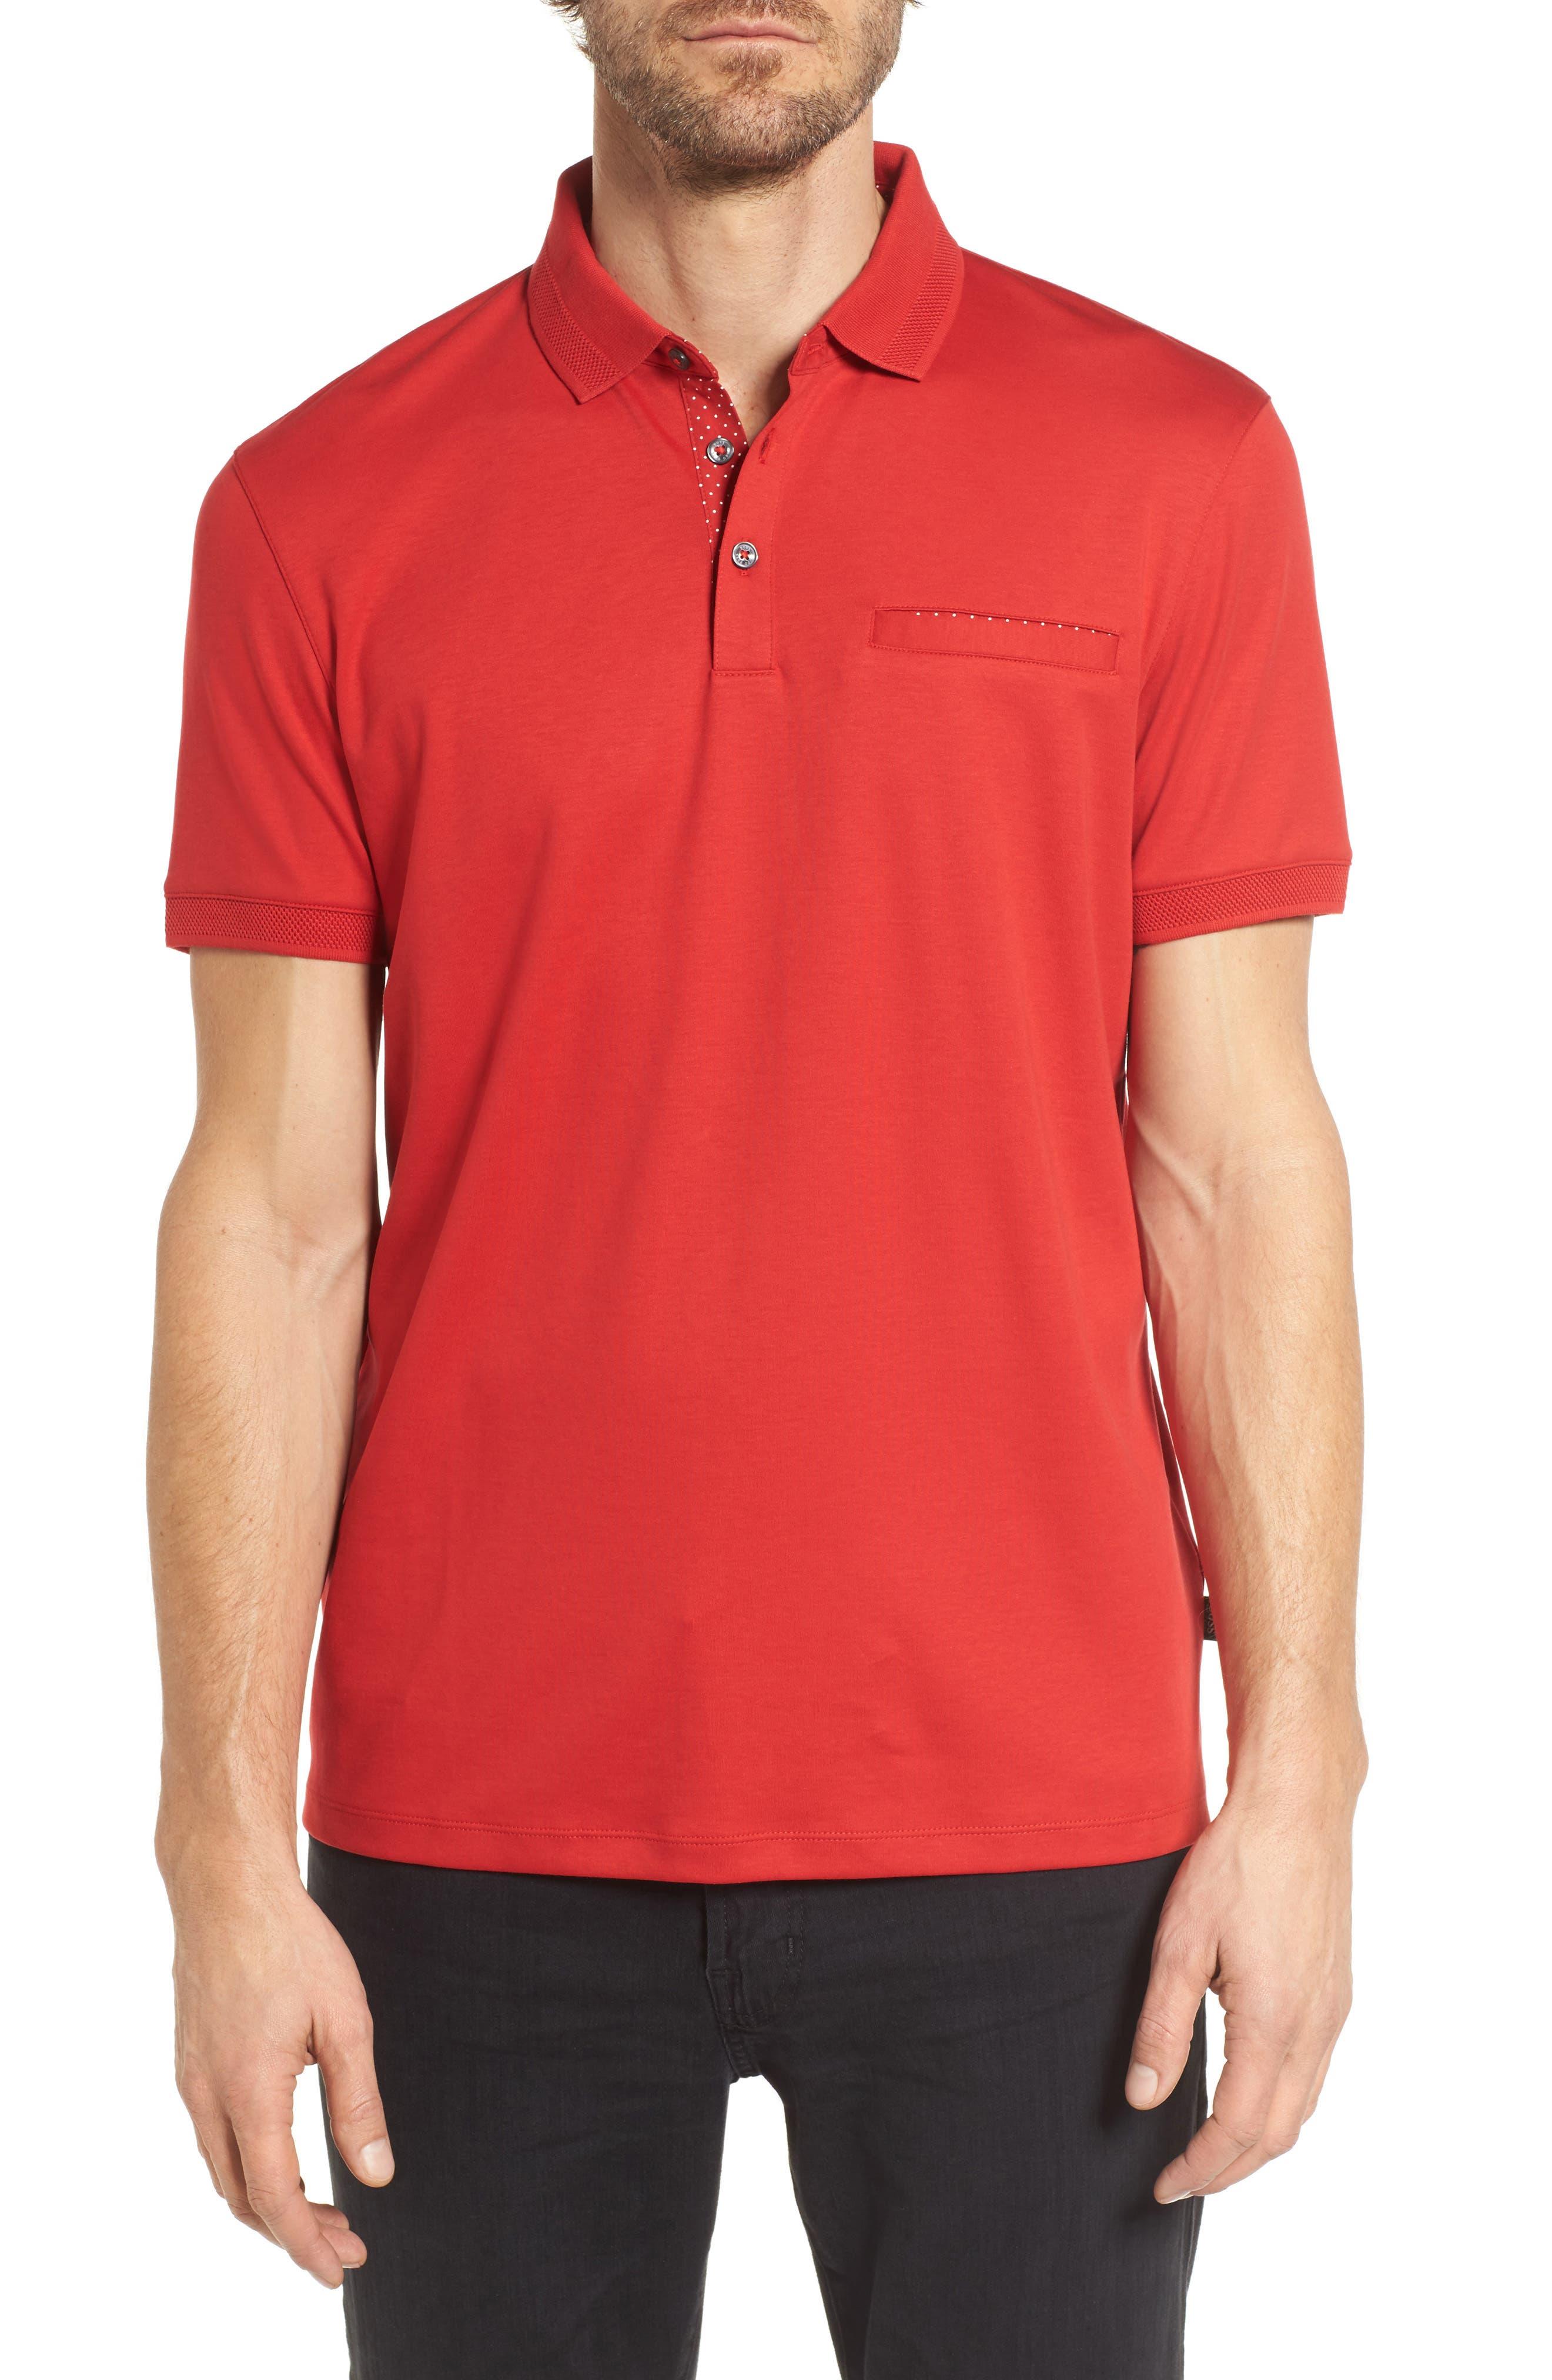 boss polo shirts for men